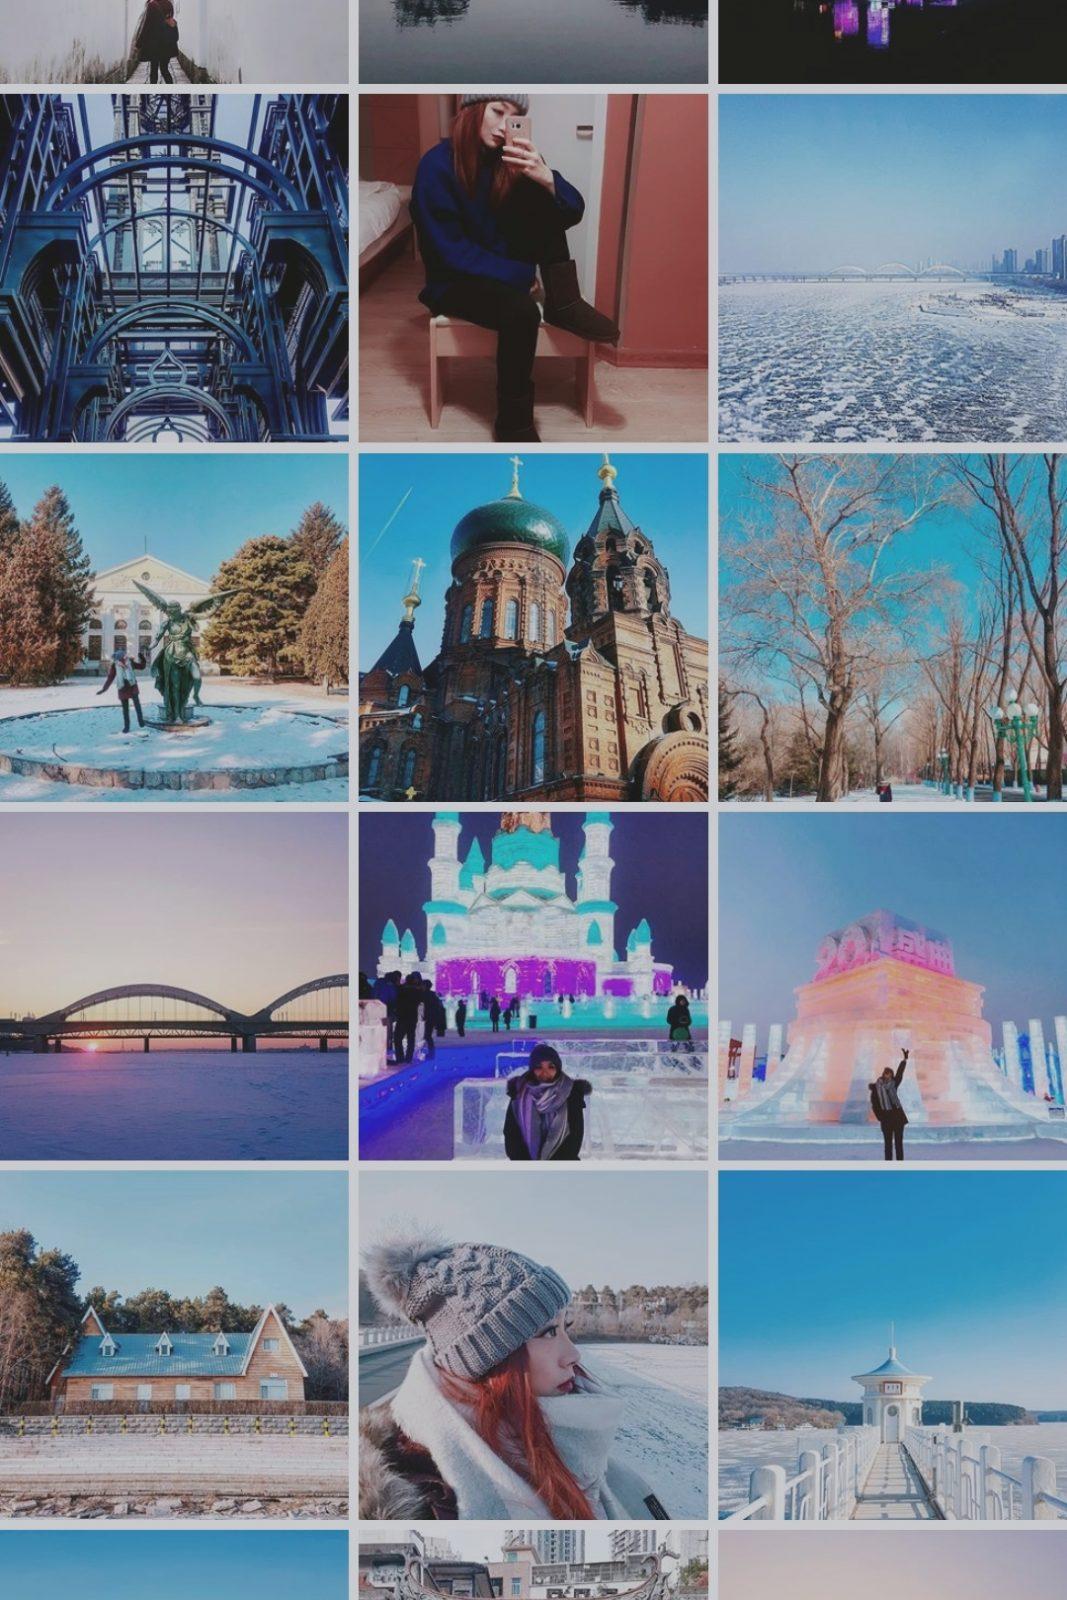 Influencer instagram yuk_lui nicolyl Nicol wong 黄郁蕾